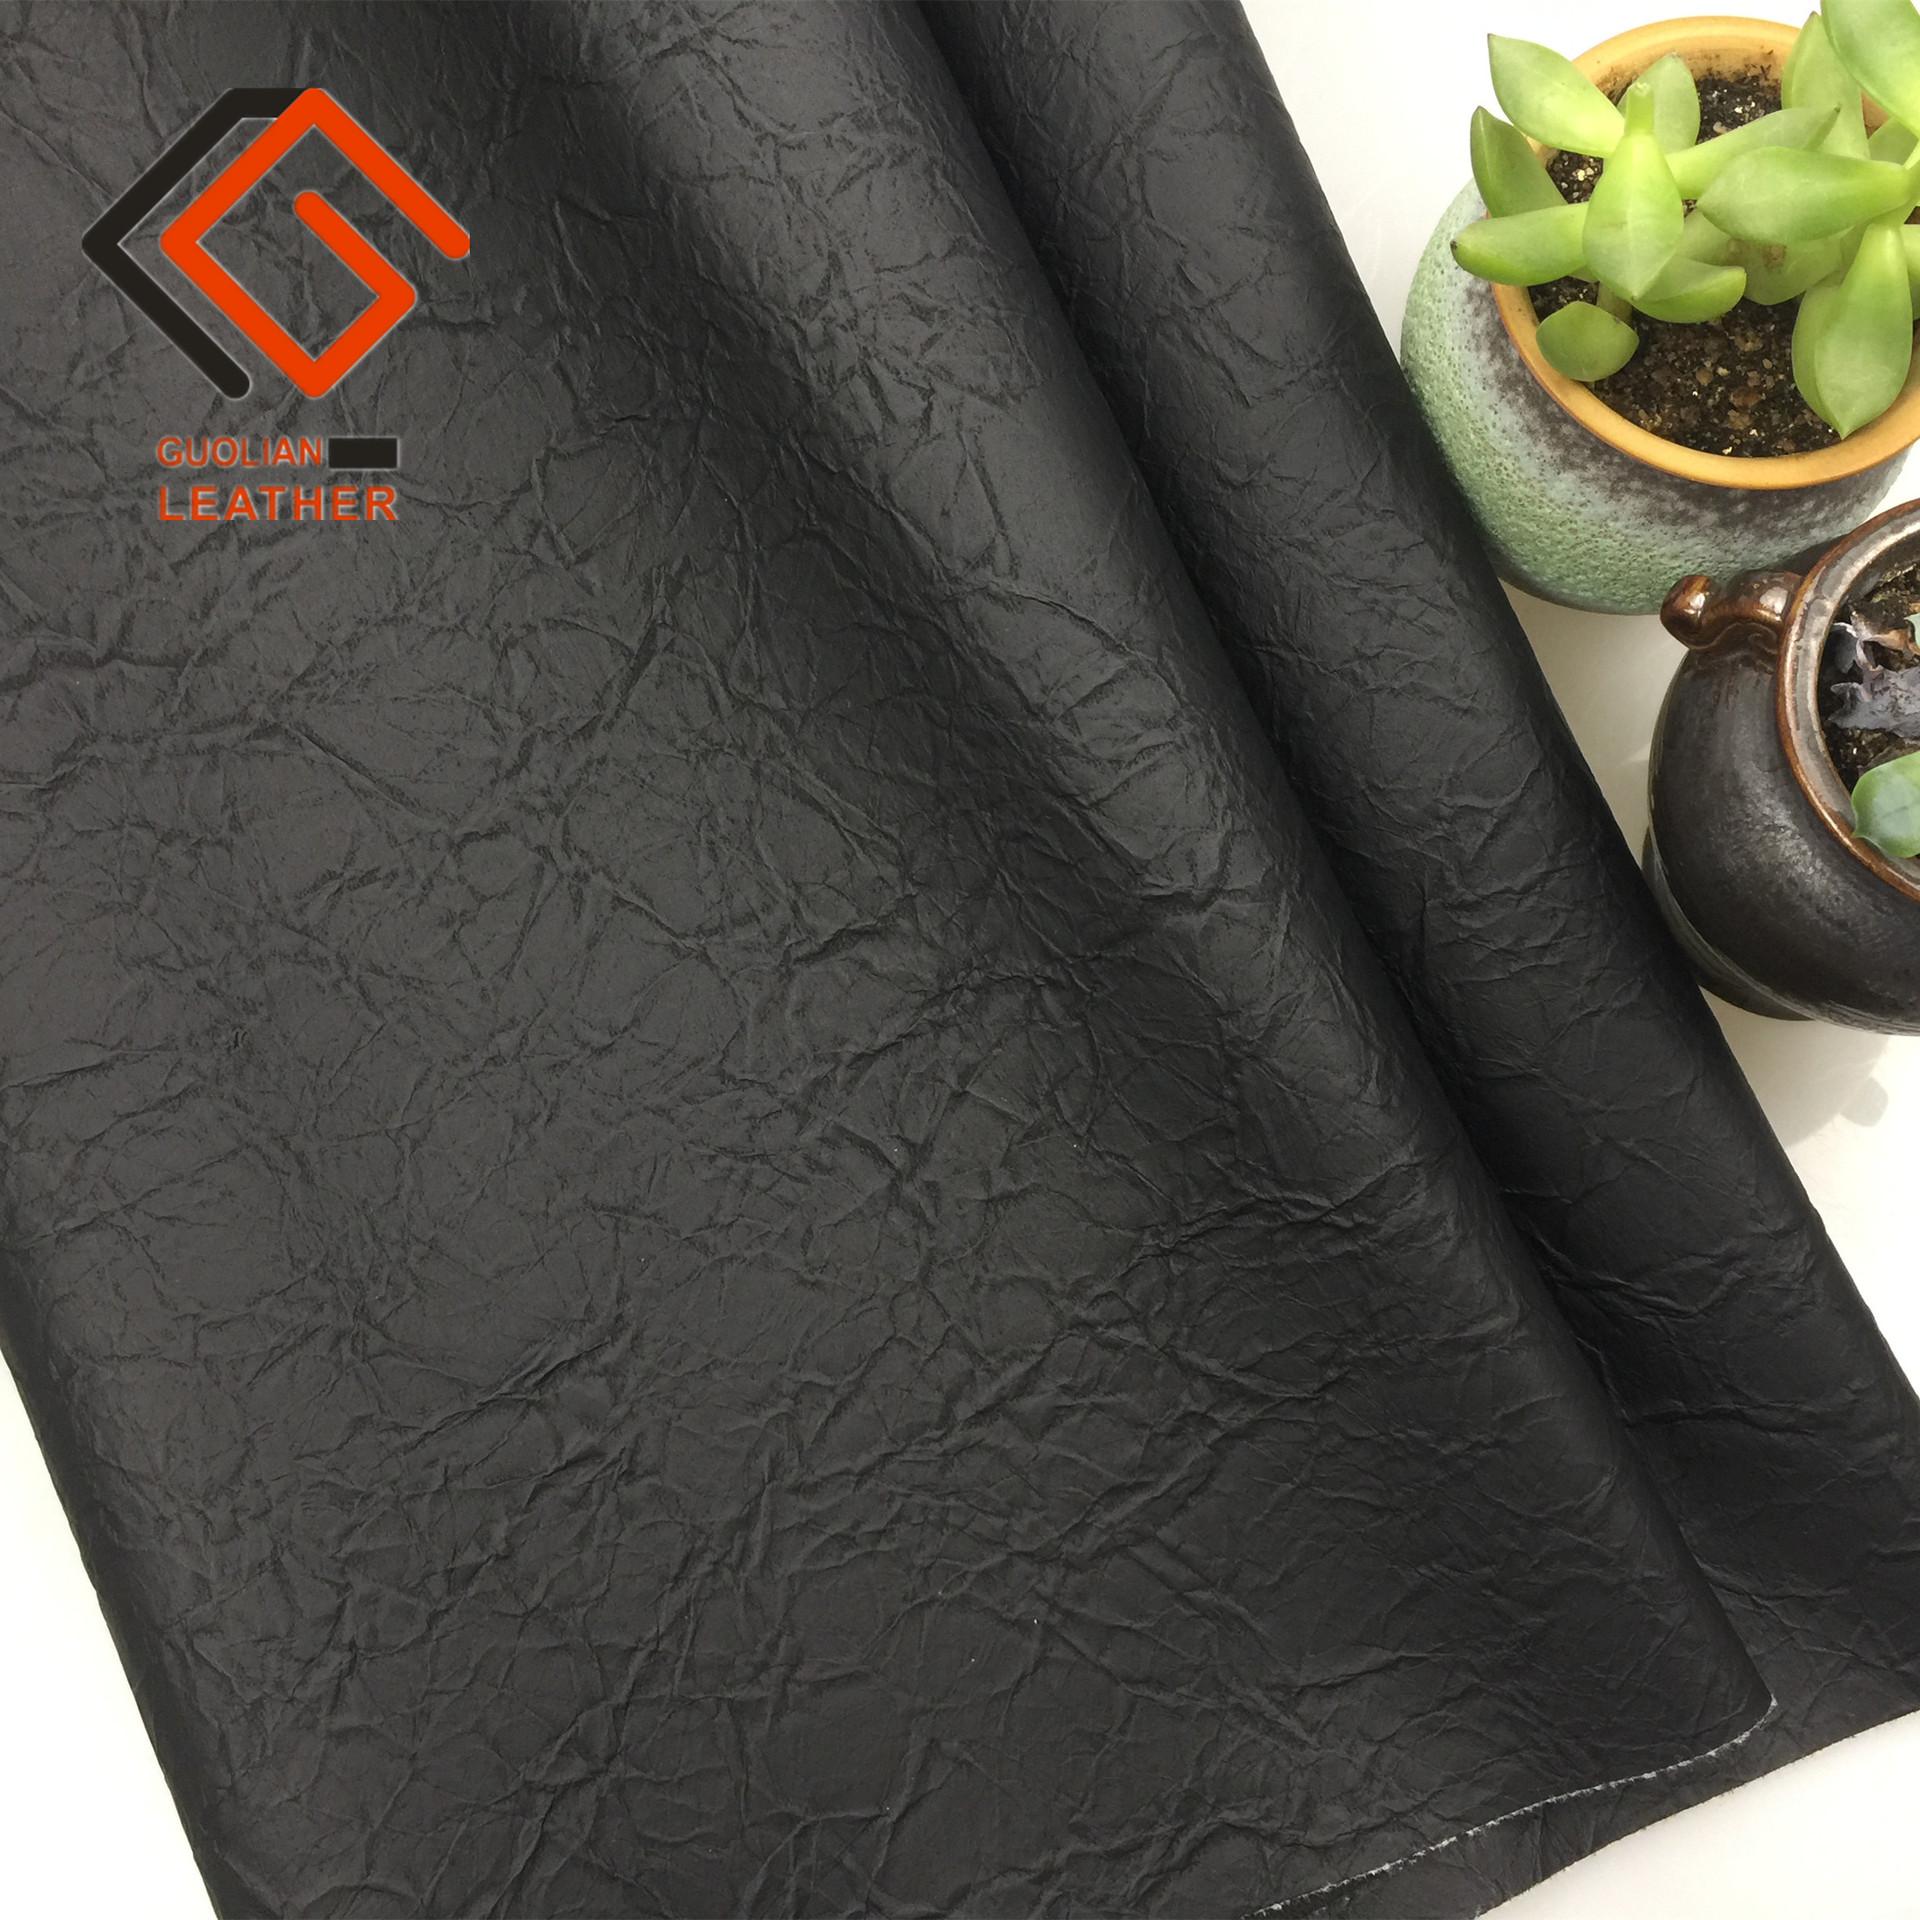 GUOLIAN pvc leather two-color folds retro kraft paper leather handbags sofa shoe fabric